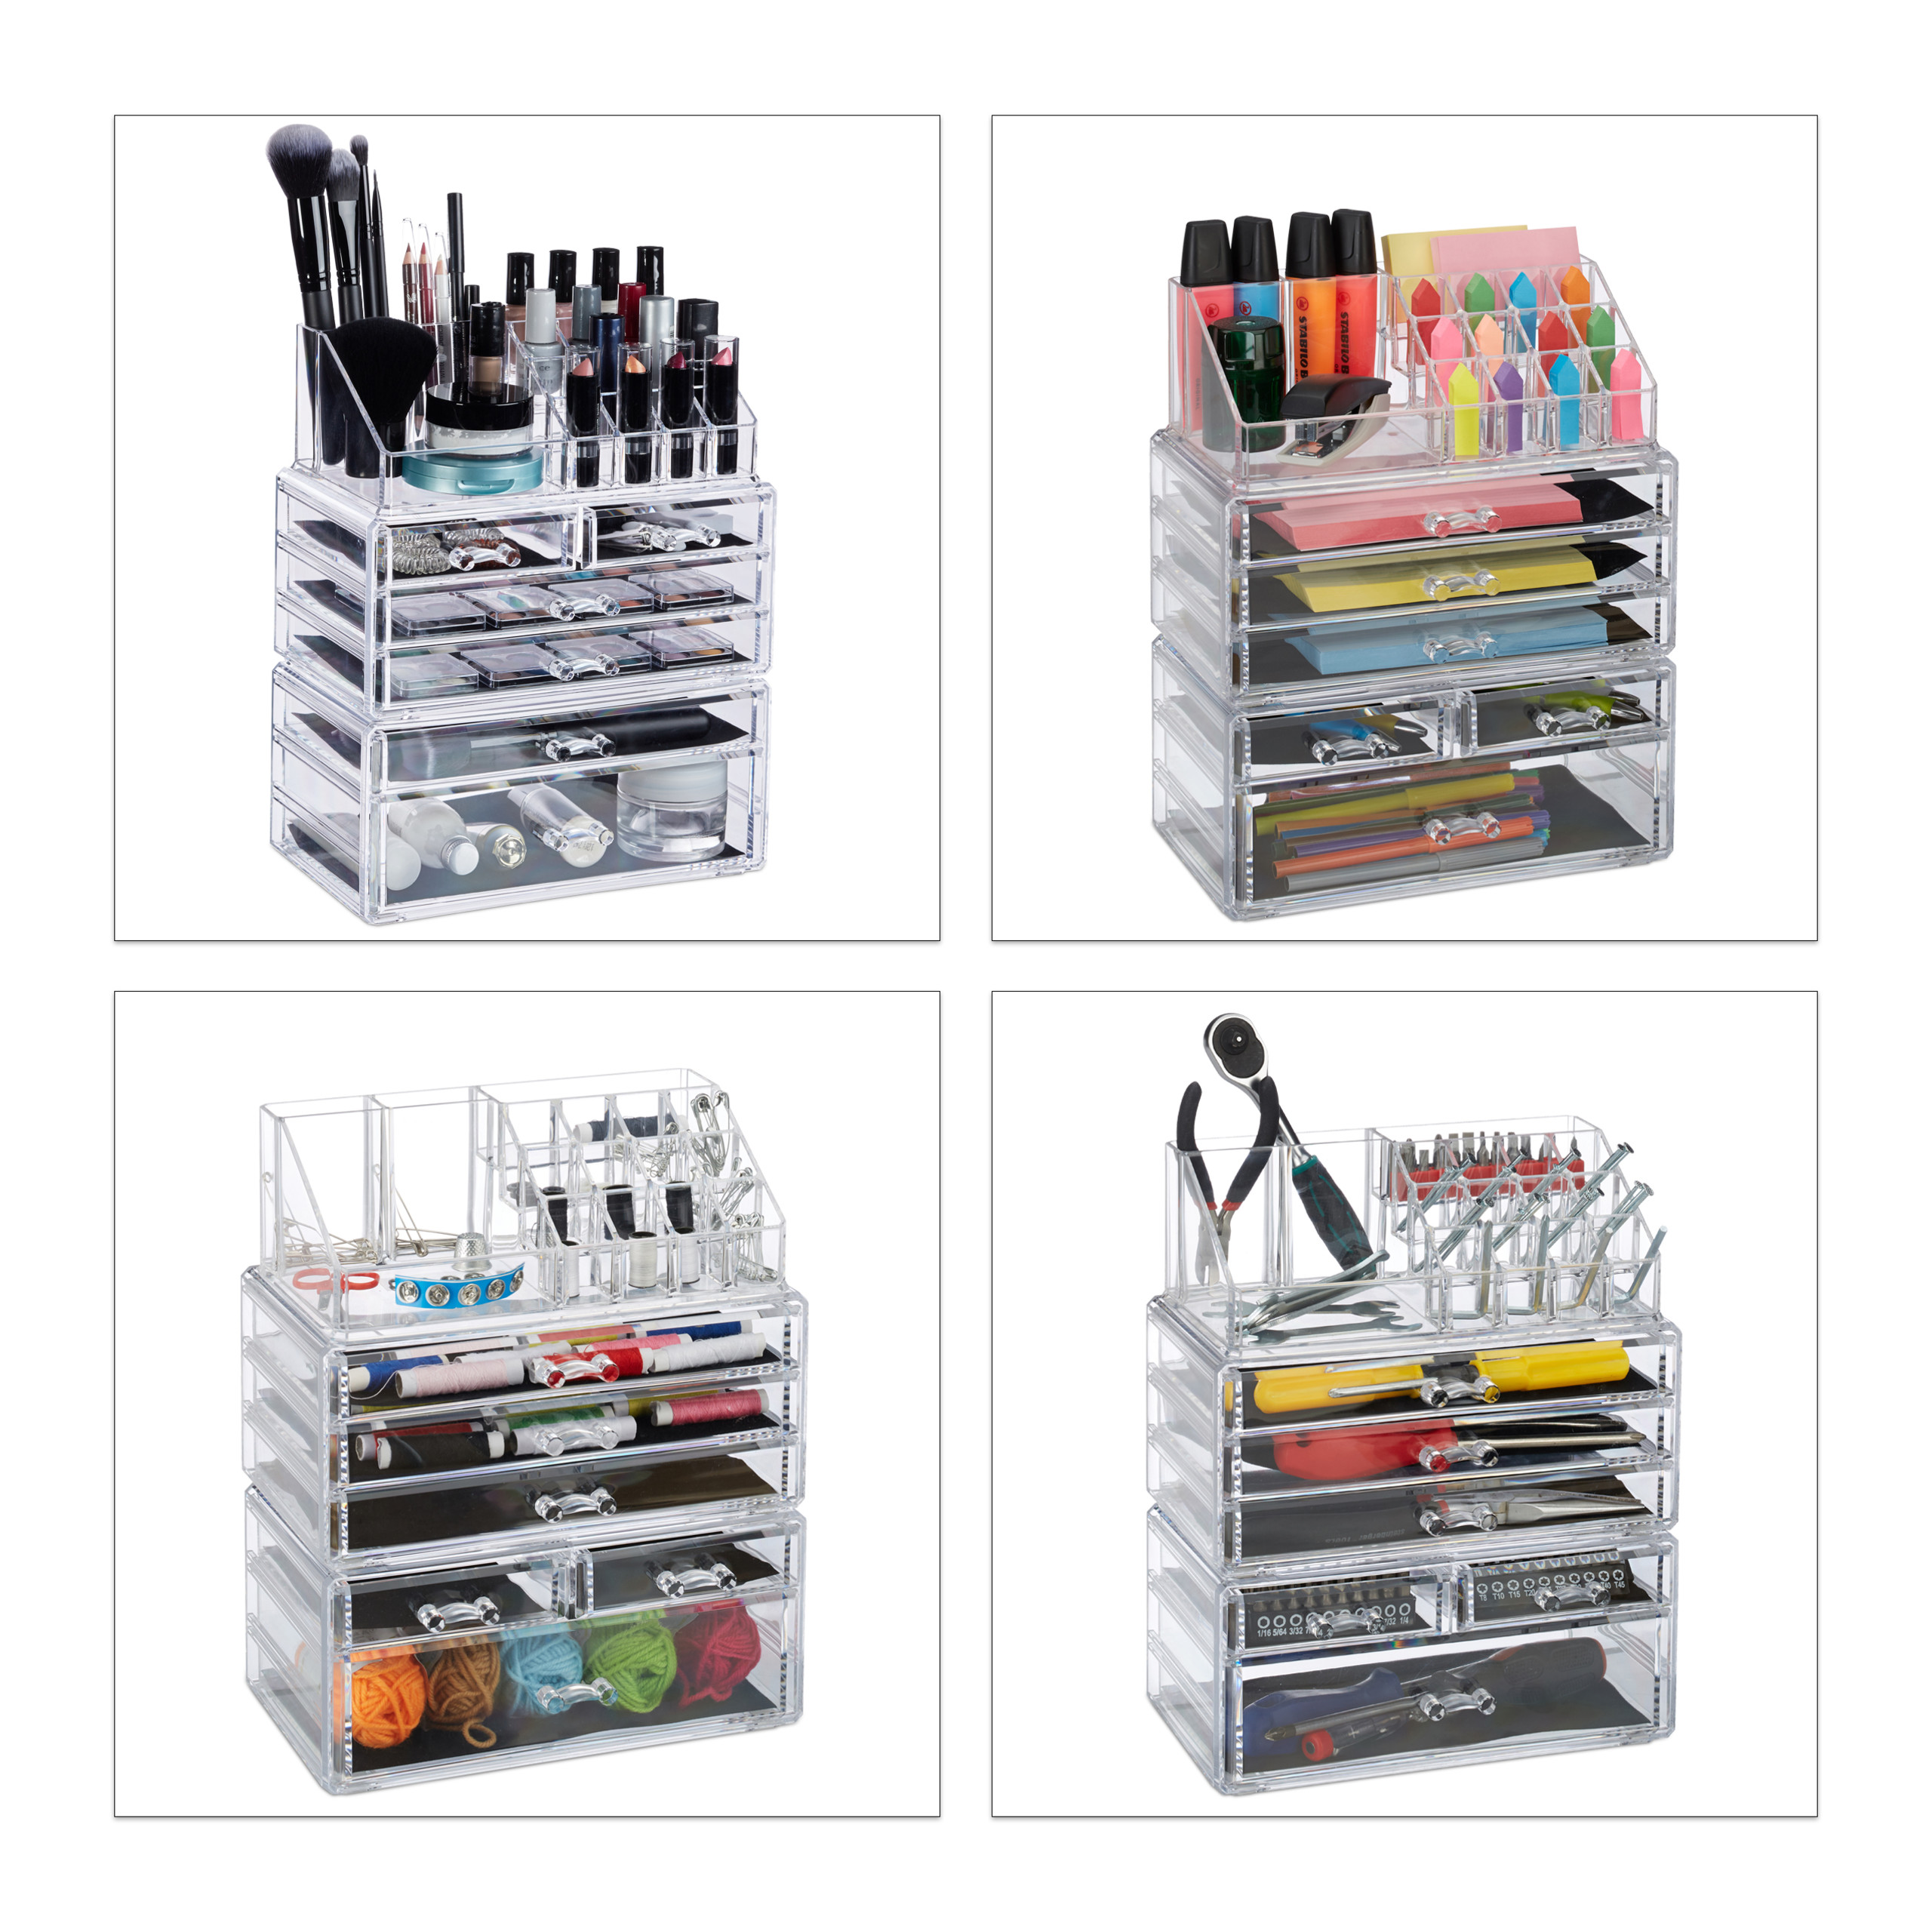 make-up-organizer-met-6-lades-acryl-cosmeticahouder-make-up-cosmetica-opslag miniatuur 4